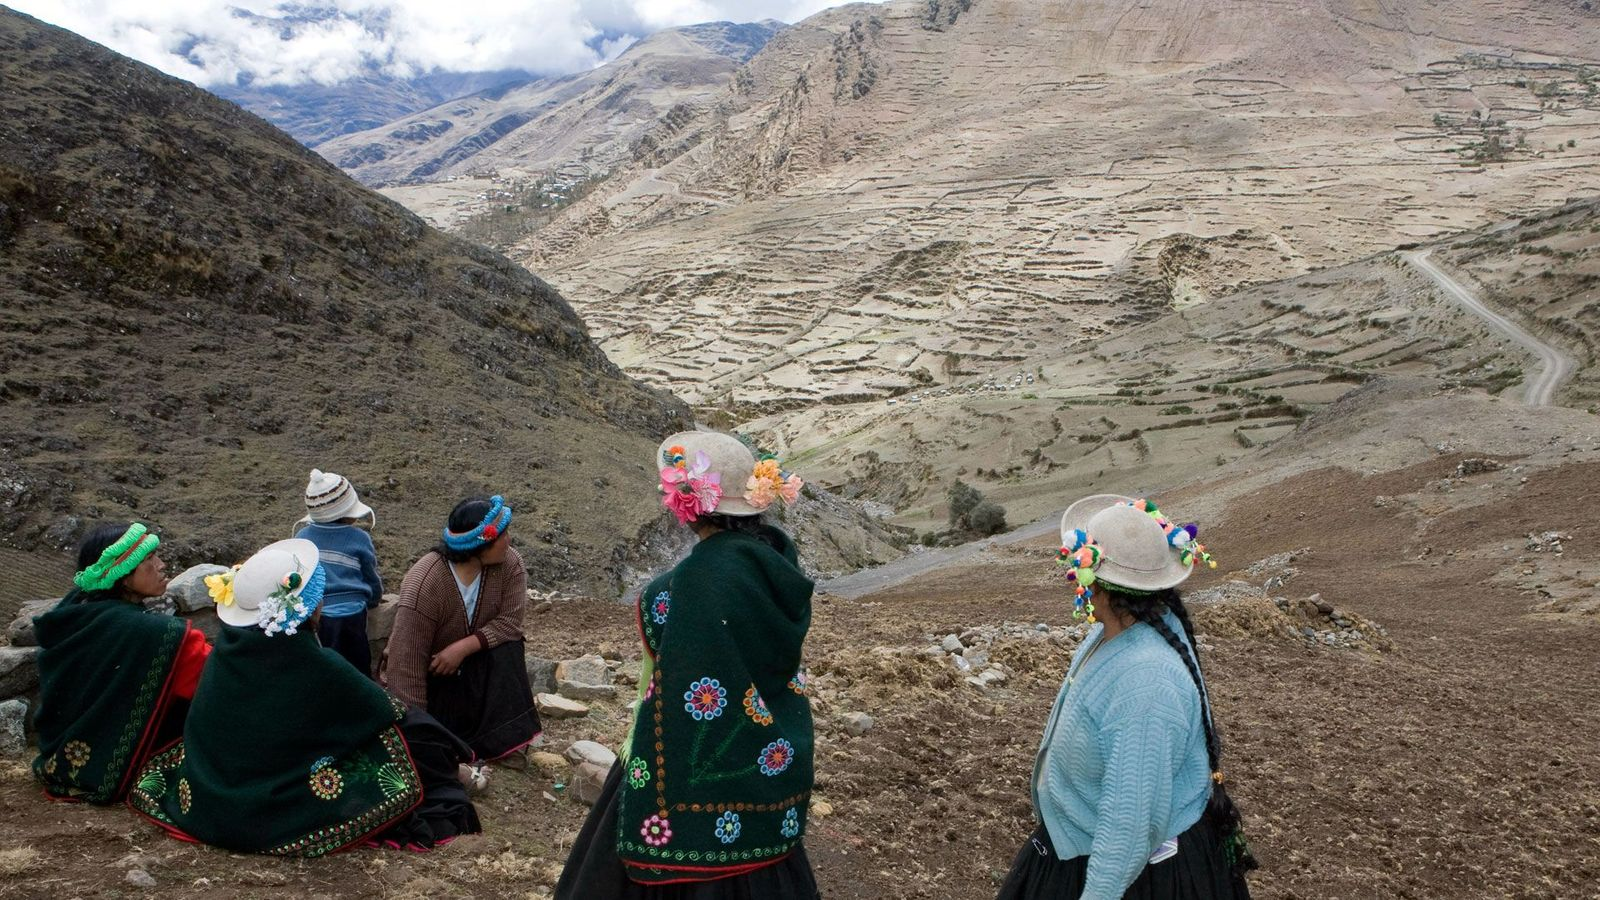 South America image